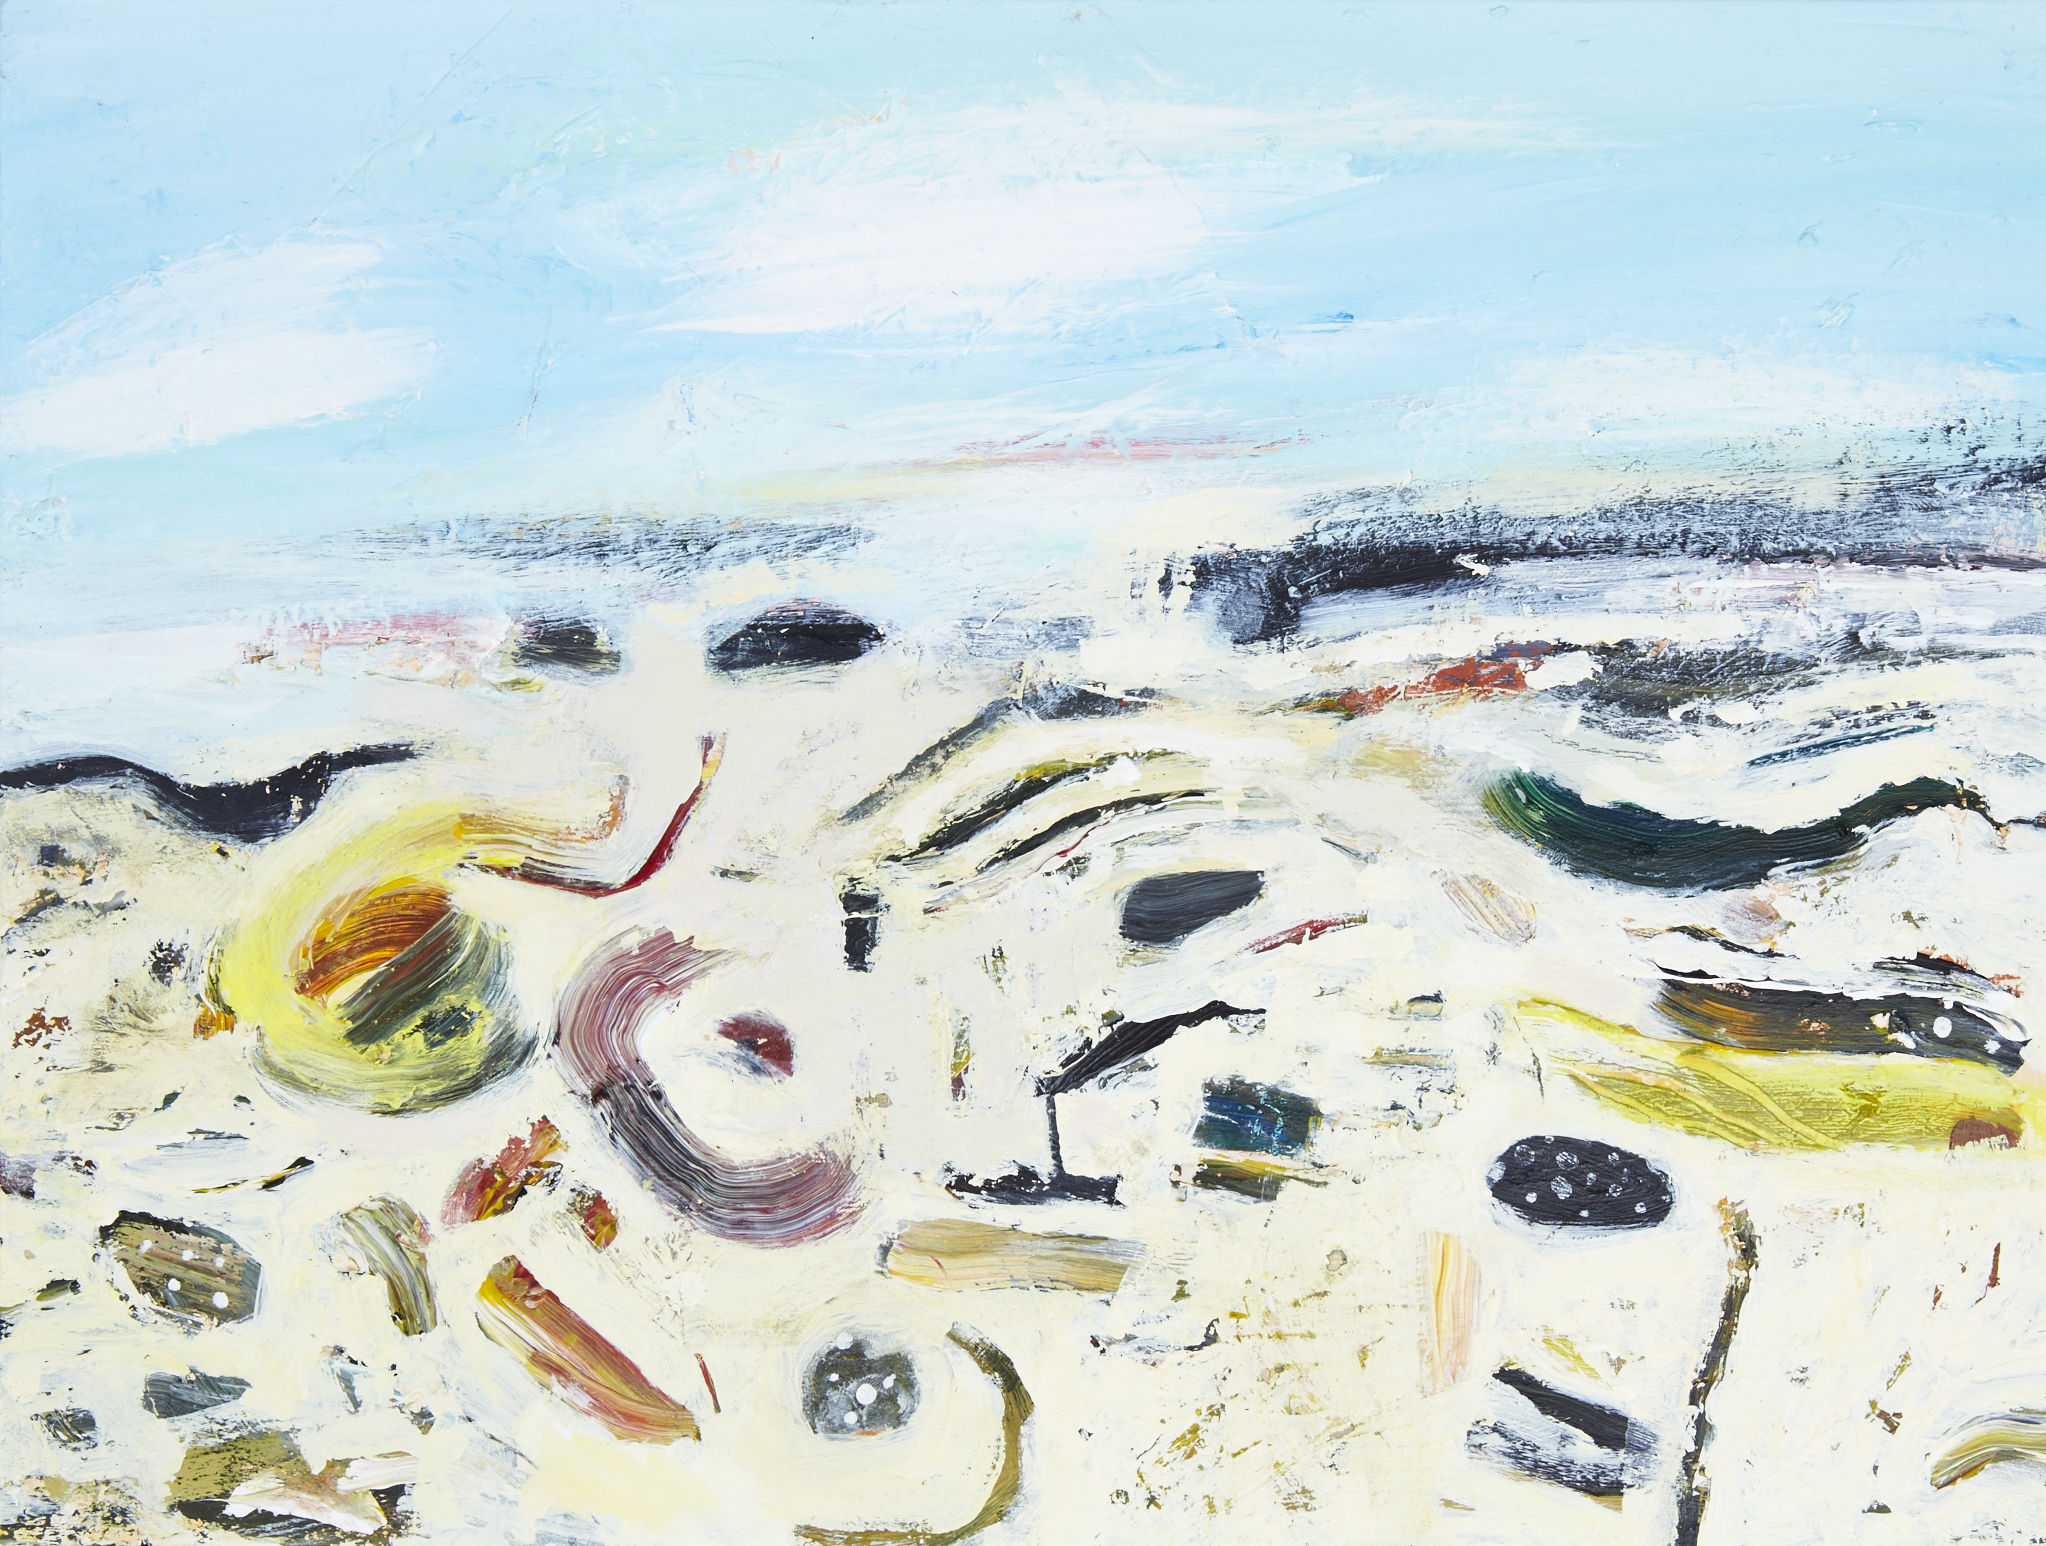 Beachscape (Small) - Coille Ghille - 300dpi 50%.jpg